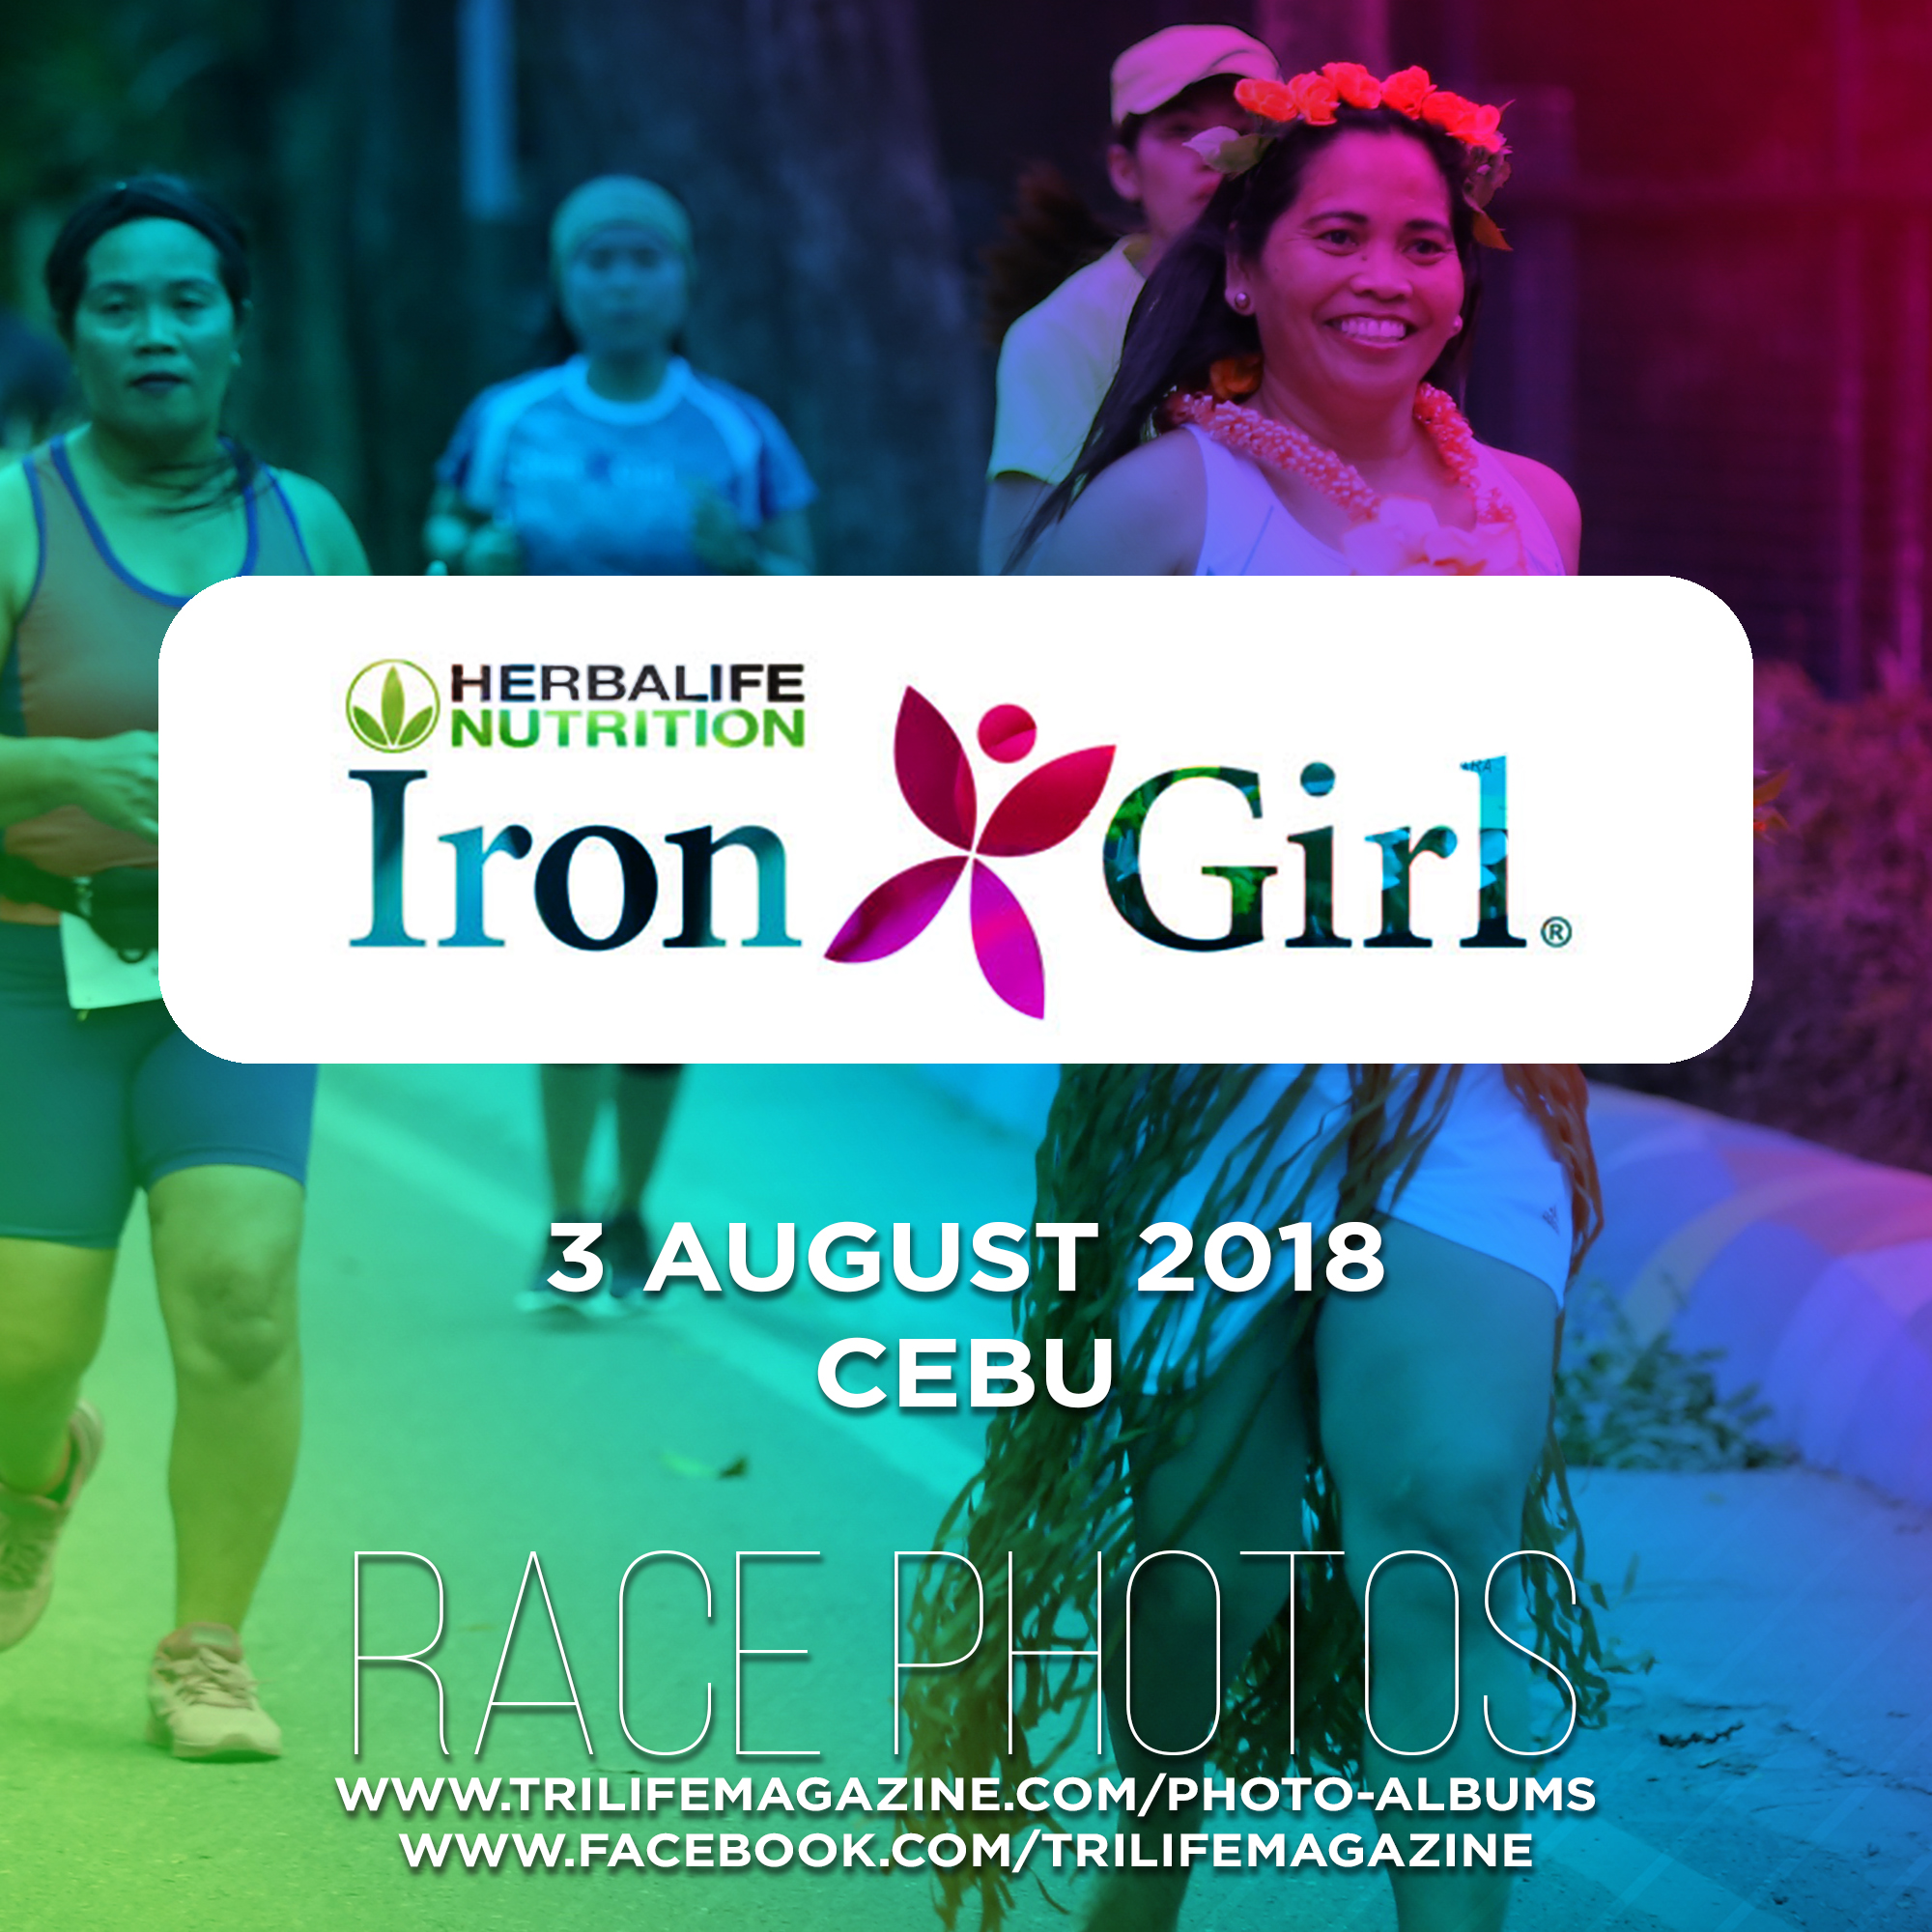 irongirl race photos.jpg